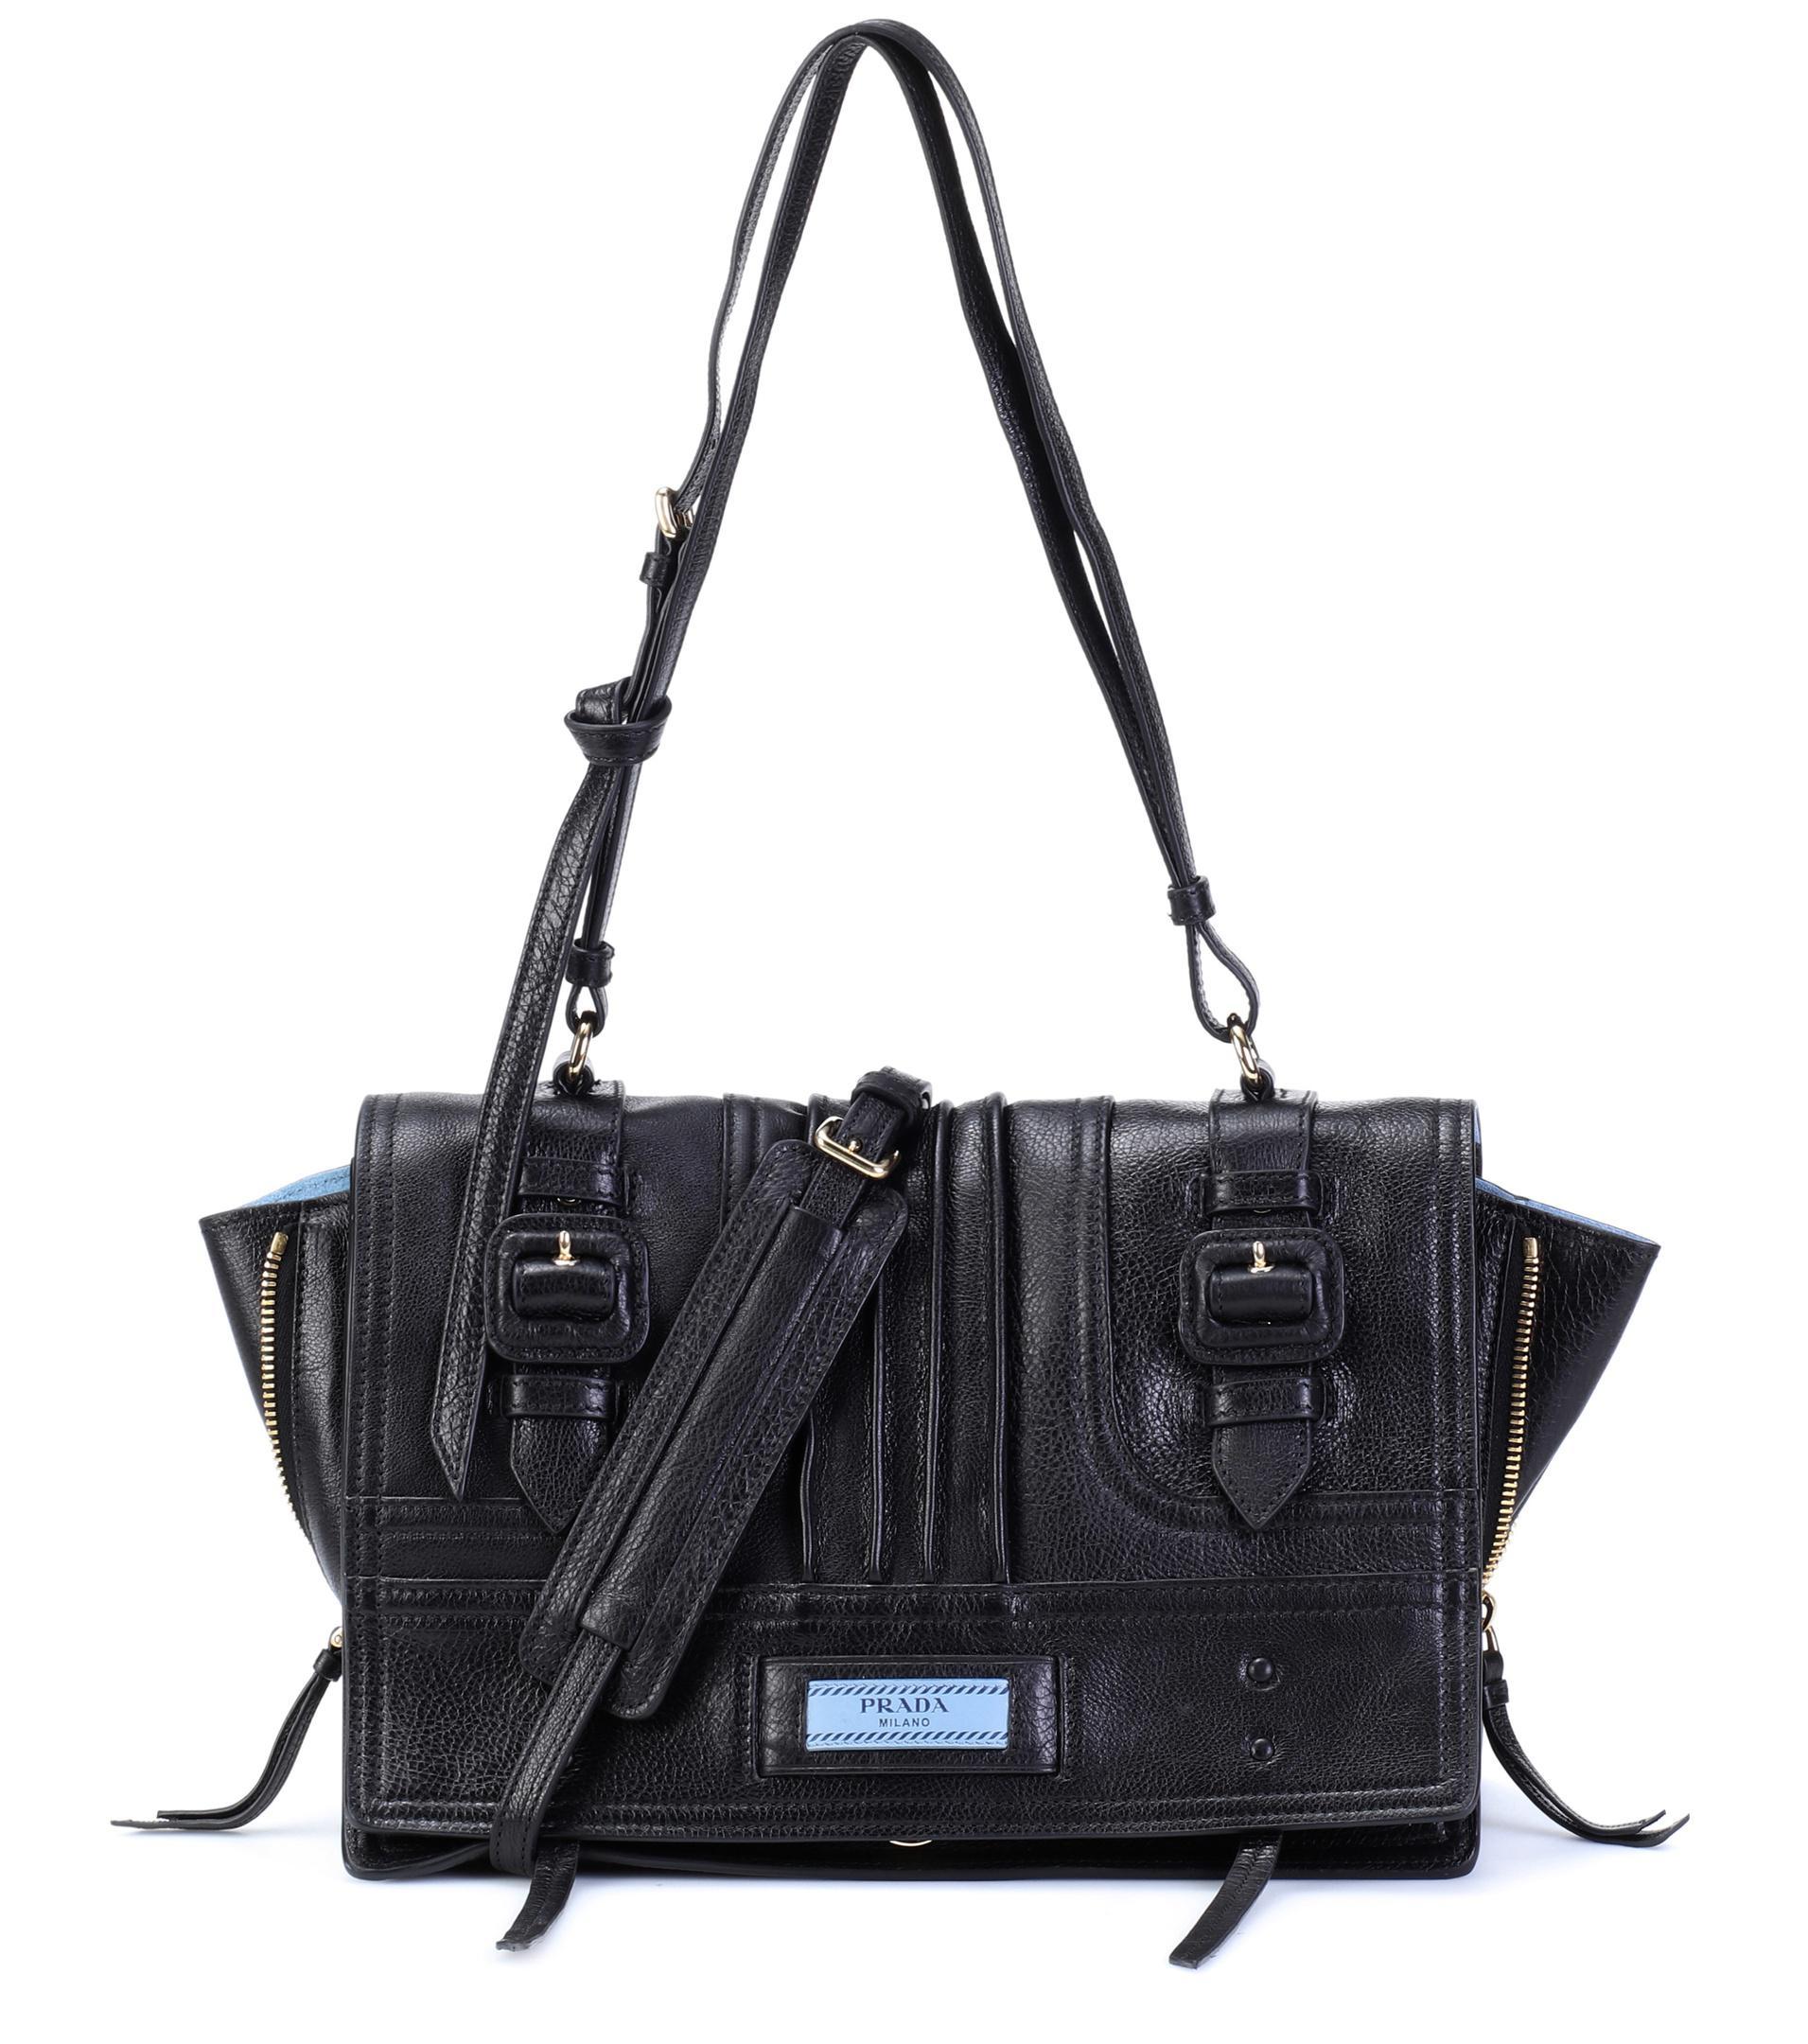 Prada Glace Etiquette Fringe Shoulder Bag h2PmFocZaY